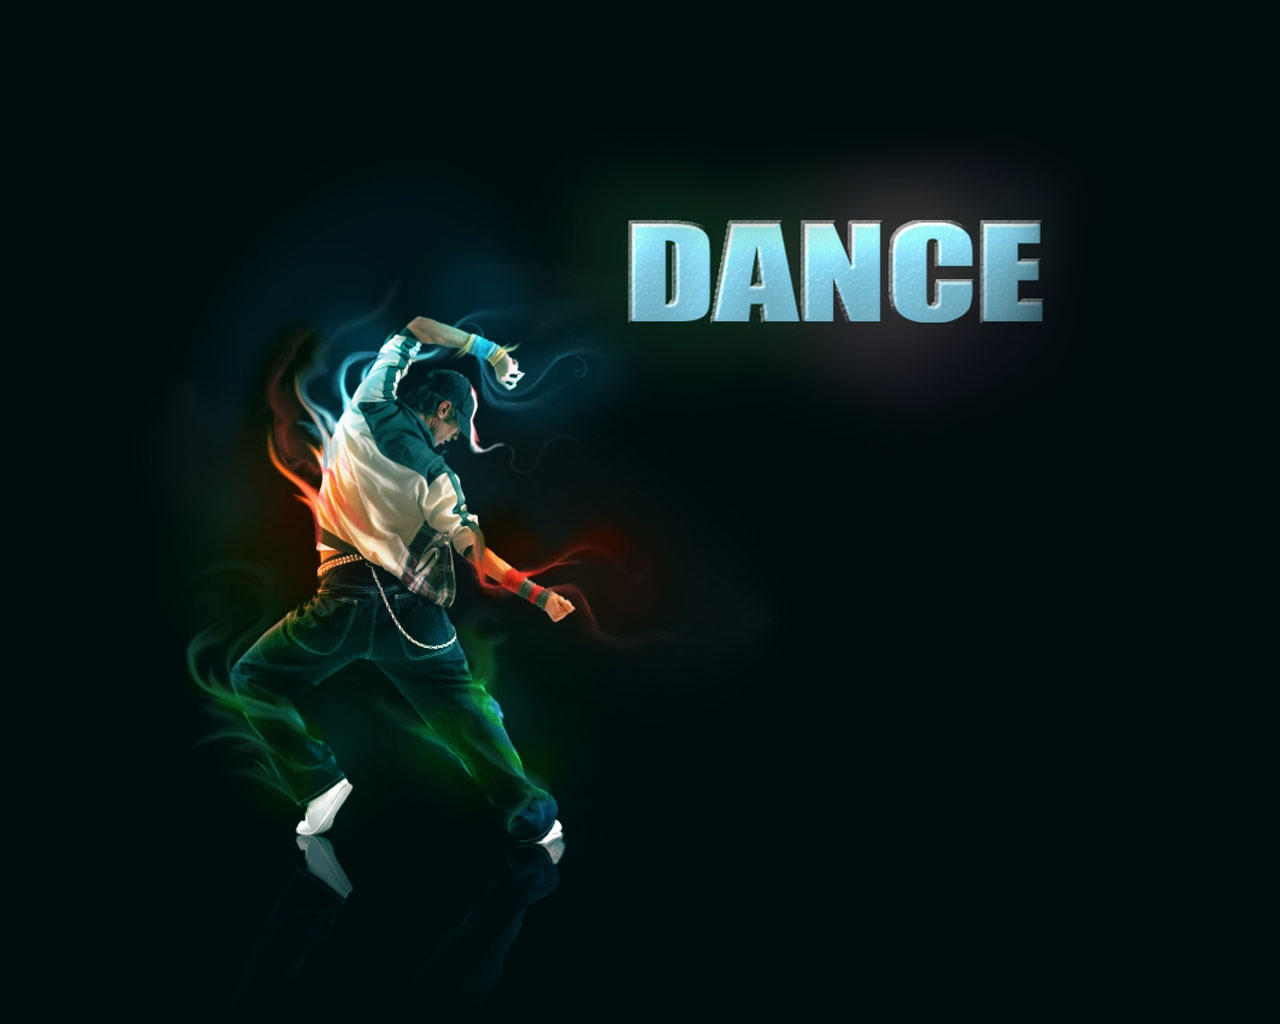 3d Dance Wallpapers For Desktop Hd 500x500 3d Dance: Cute HD Pictures: Q Dance Wallpaper